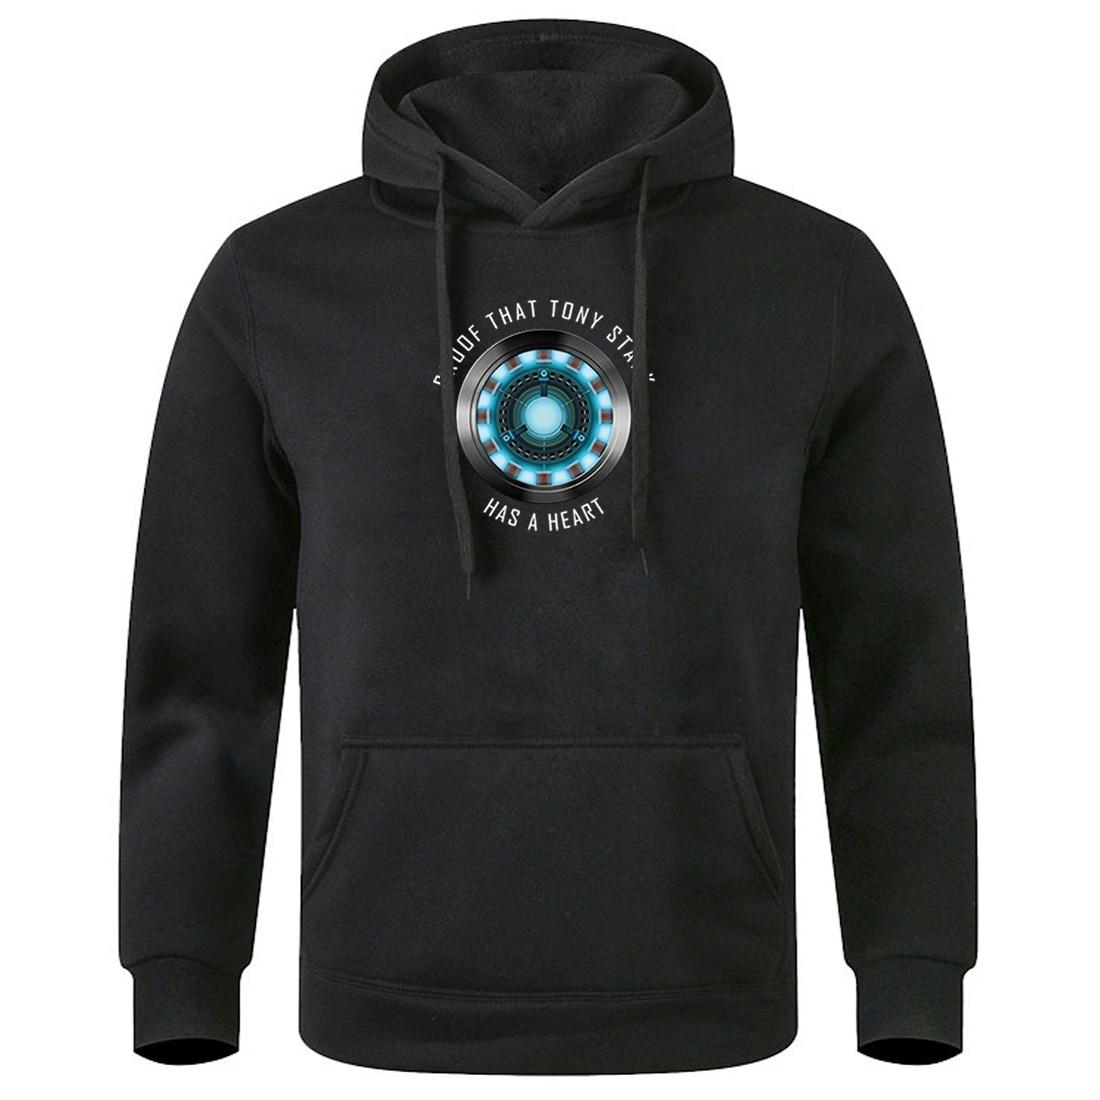 Male Hooded Tops The Avengers Tony Stark Clothing 2020 Keep Warm Autumn Winter Sweatshirts Streetwear Mens Long Sleeve Clothes